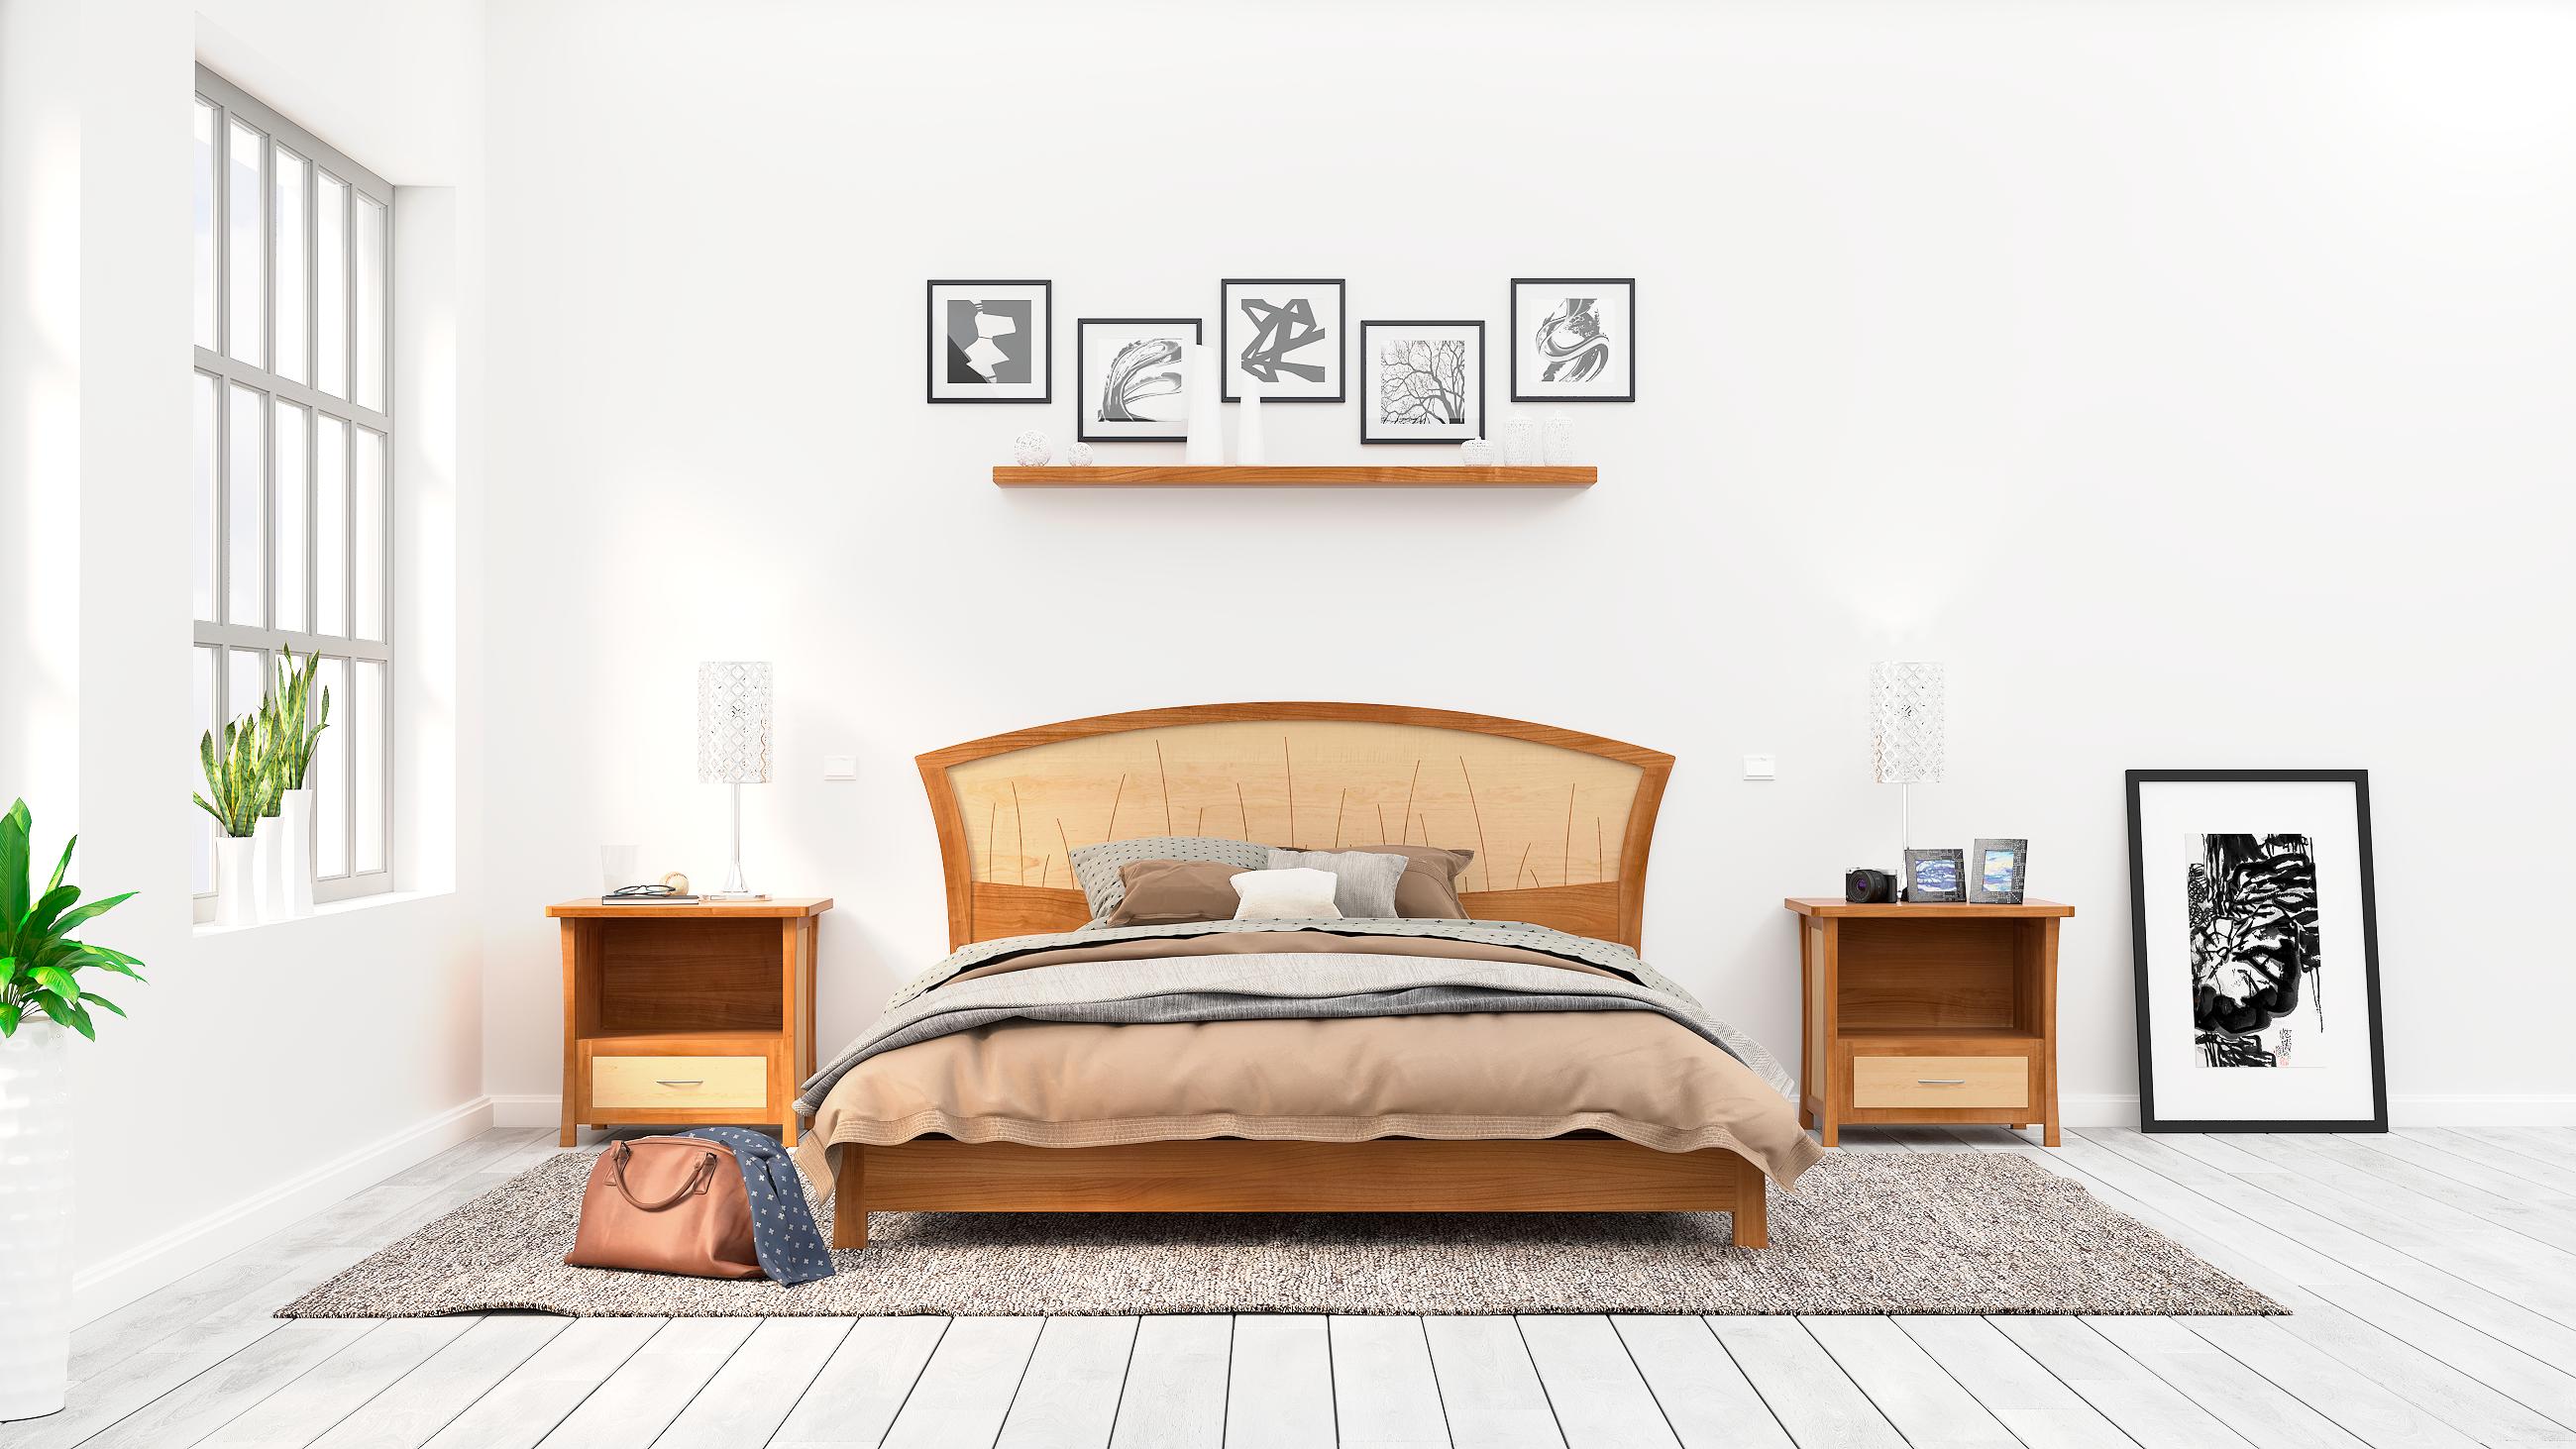 Custom Made Modern Platform Bed Queen Size Low Bed Frame